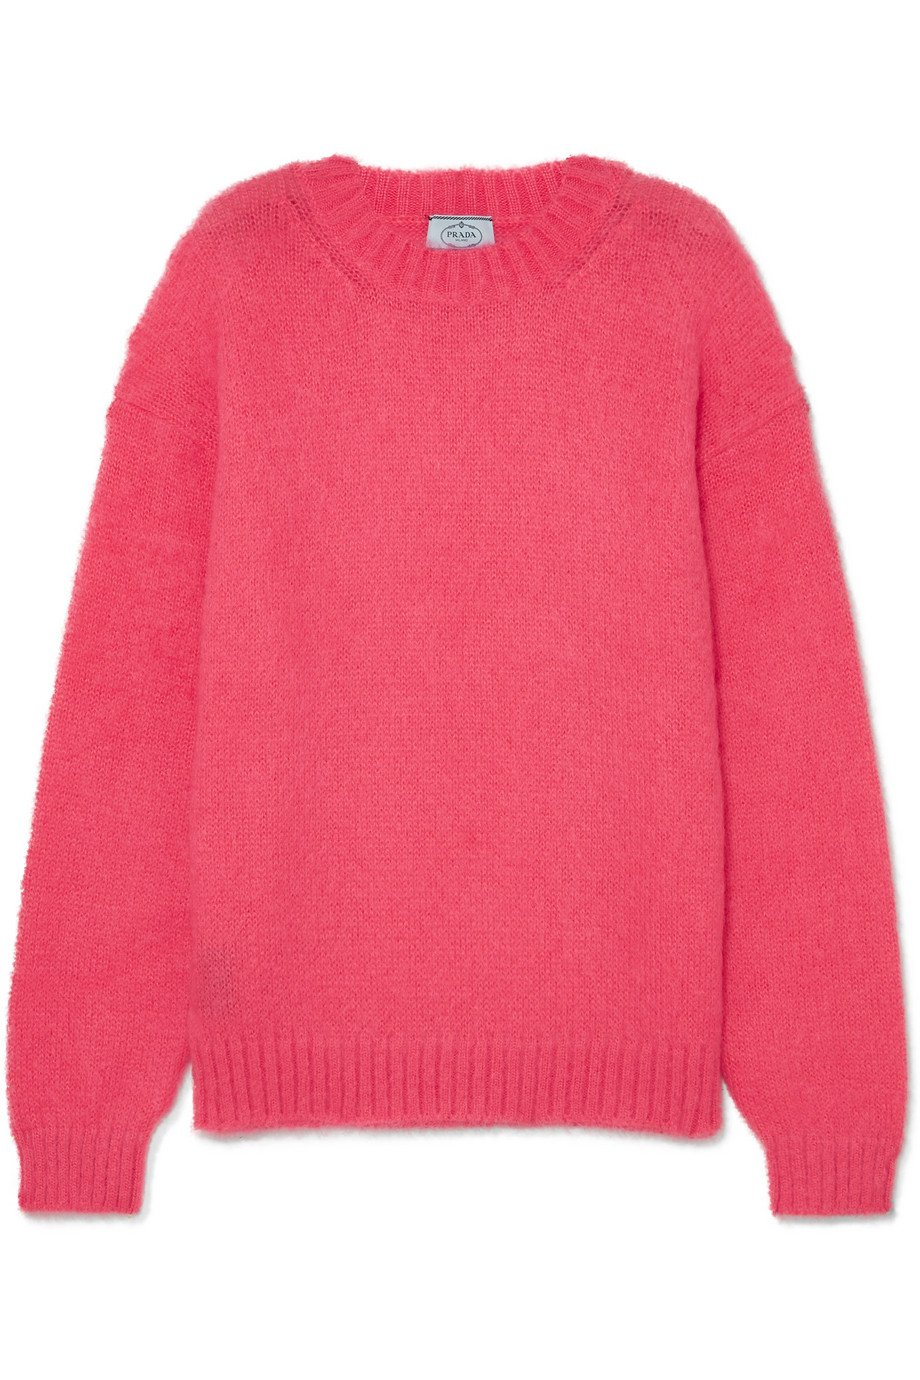 Prada | Oversized mohair-blend sweater | NET-A-PORTER.COM